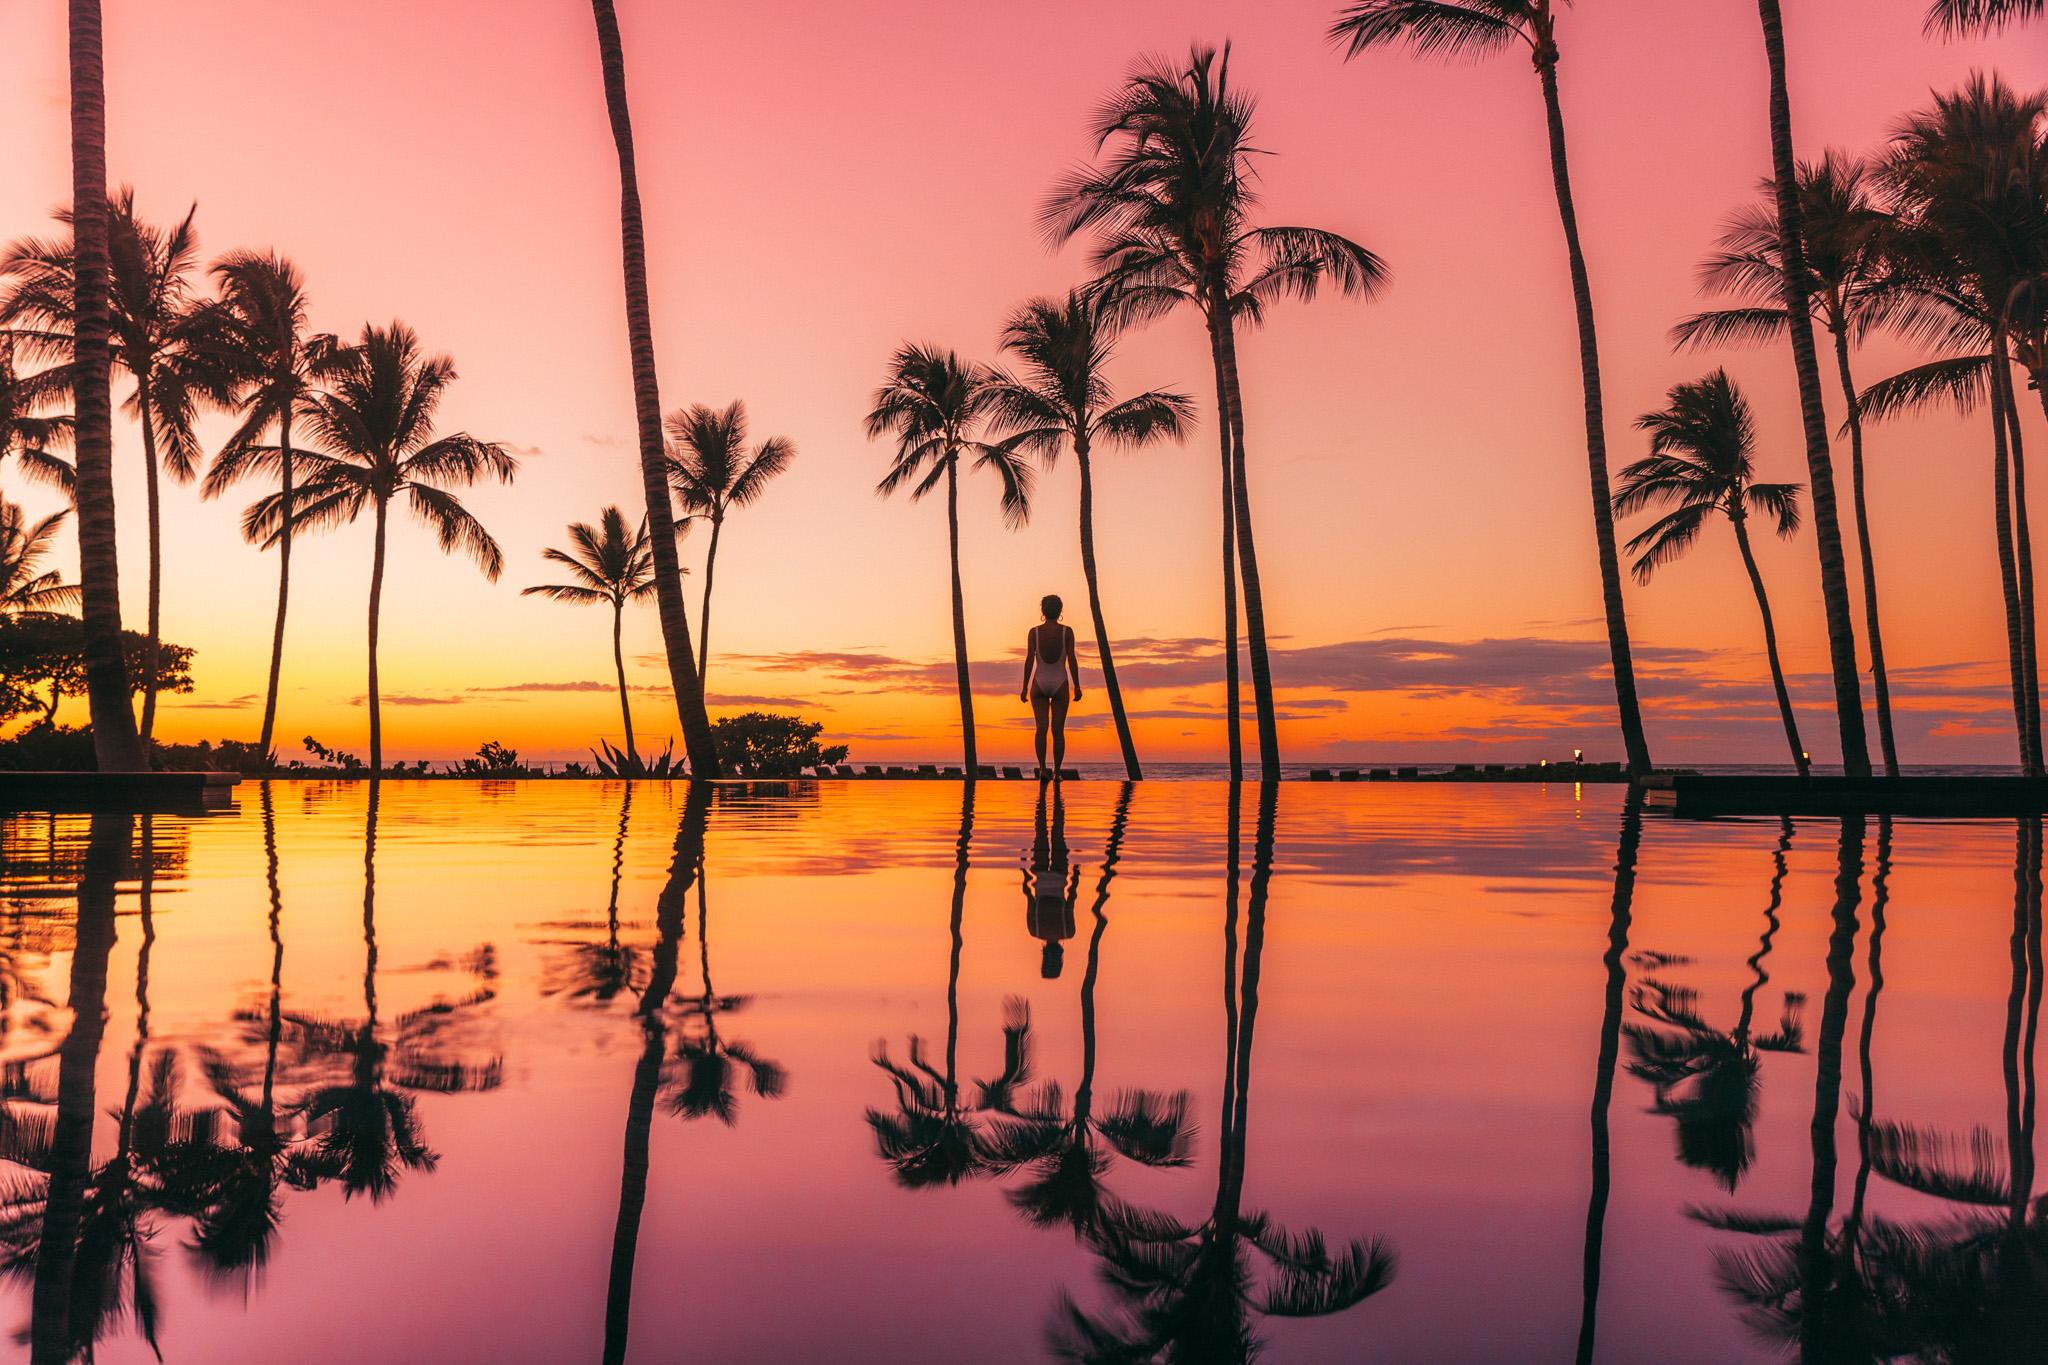 Palm Grove Pool sunset // A Luxury Stay on the Big Island: Four Seasons Resort Hualalai // #readysetjetset #hawaii #bigisland #luxuryhotels #beachresorts #usa #travel